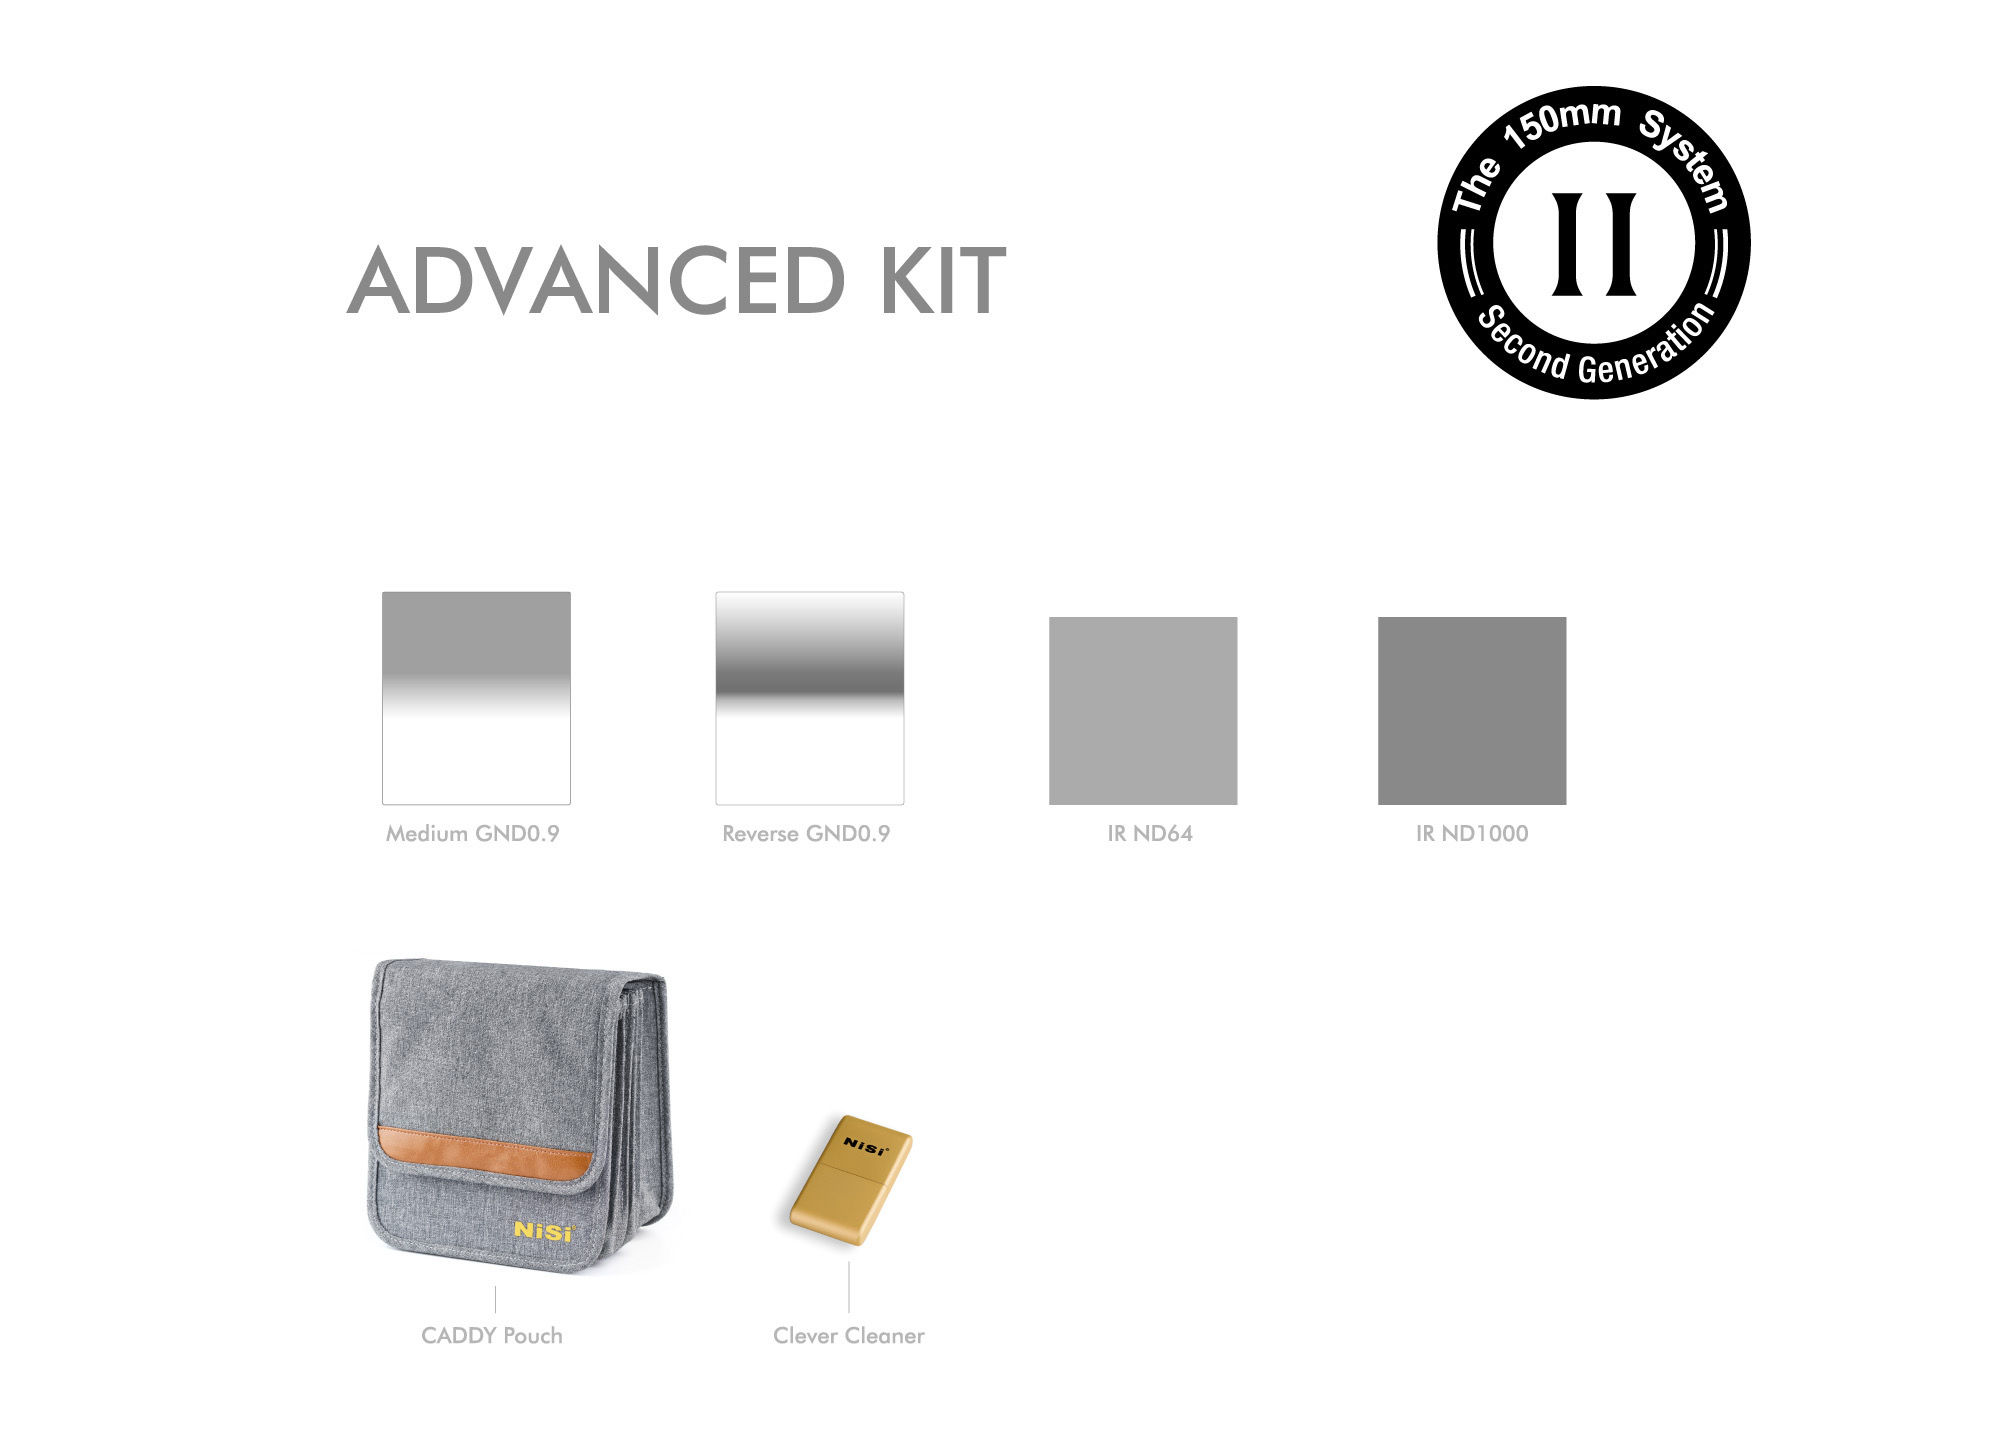 NiSi 150mm advance kit II